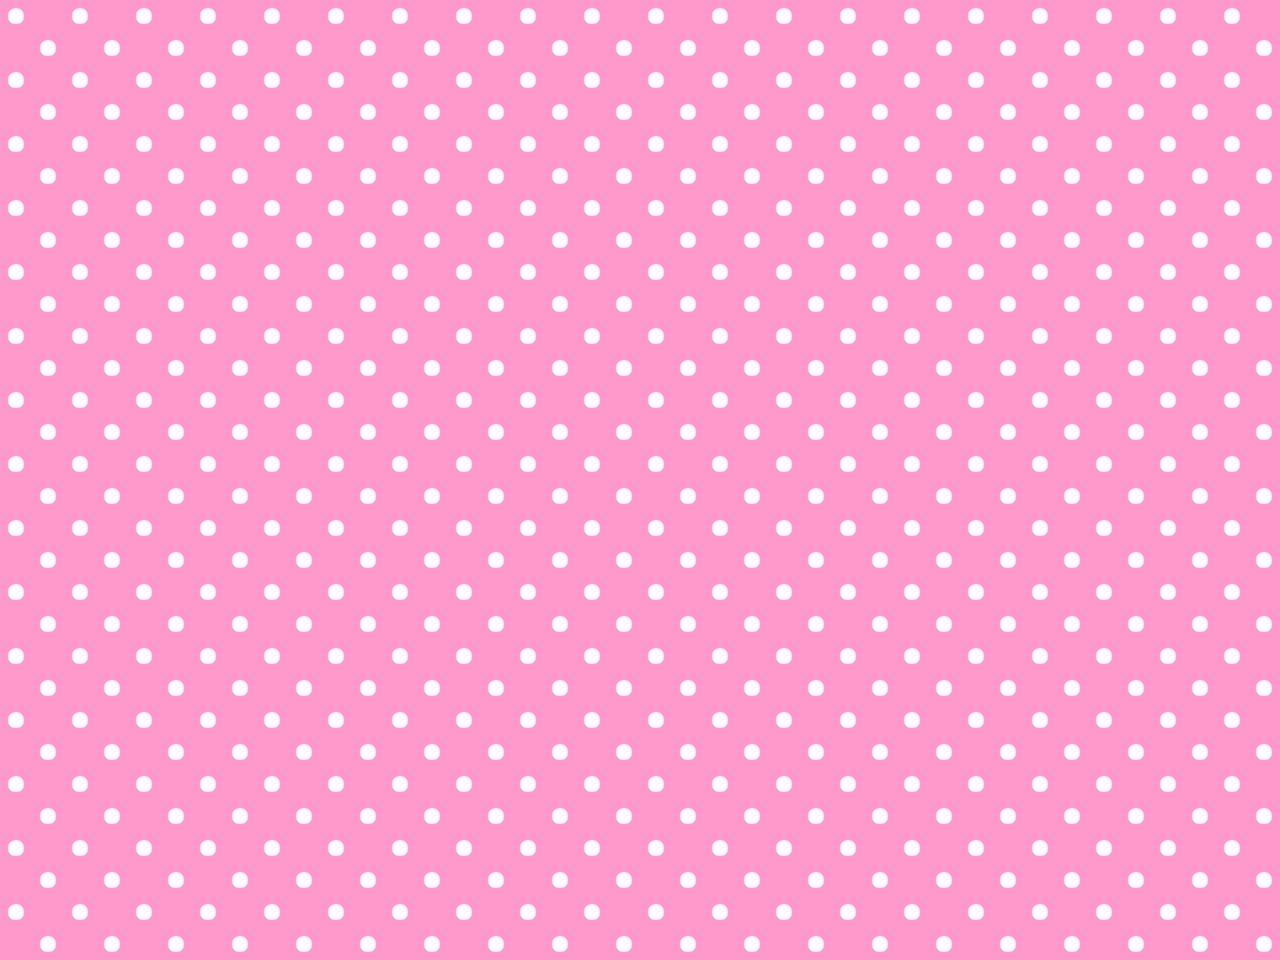 Mickey Mouse Bathroom Ideas Pink Polka Dot Wallpaper Wallpapersafari